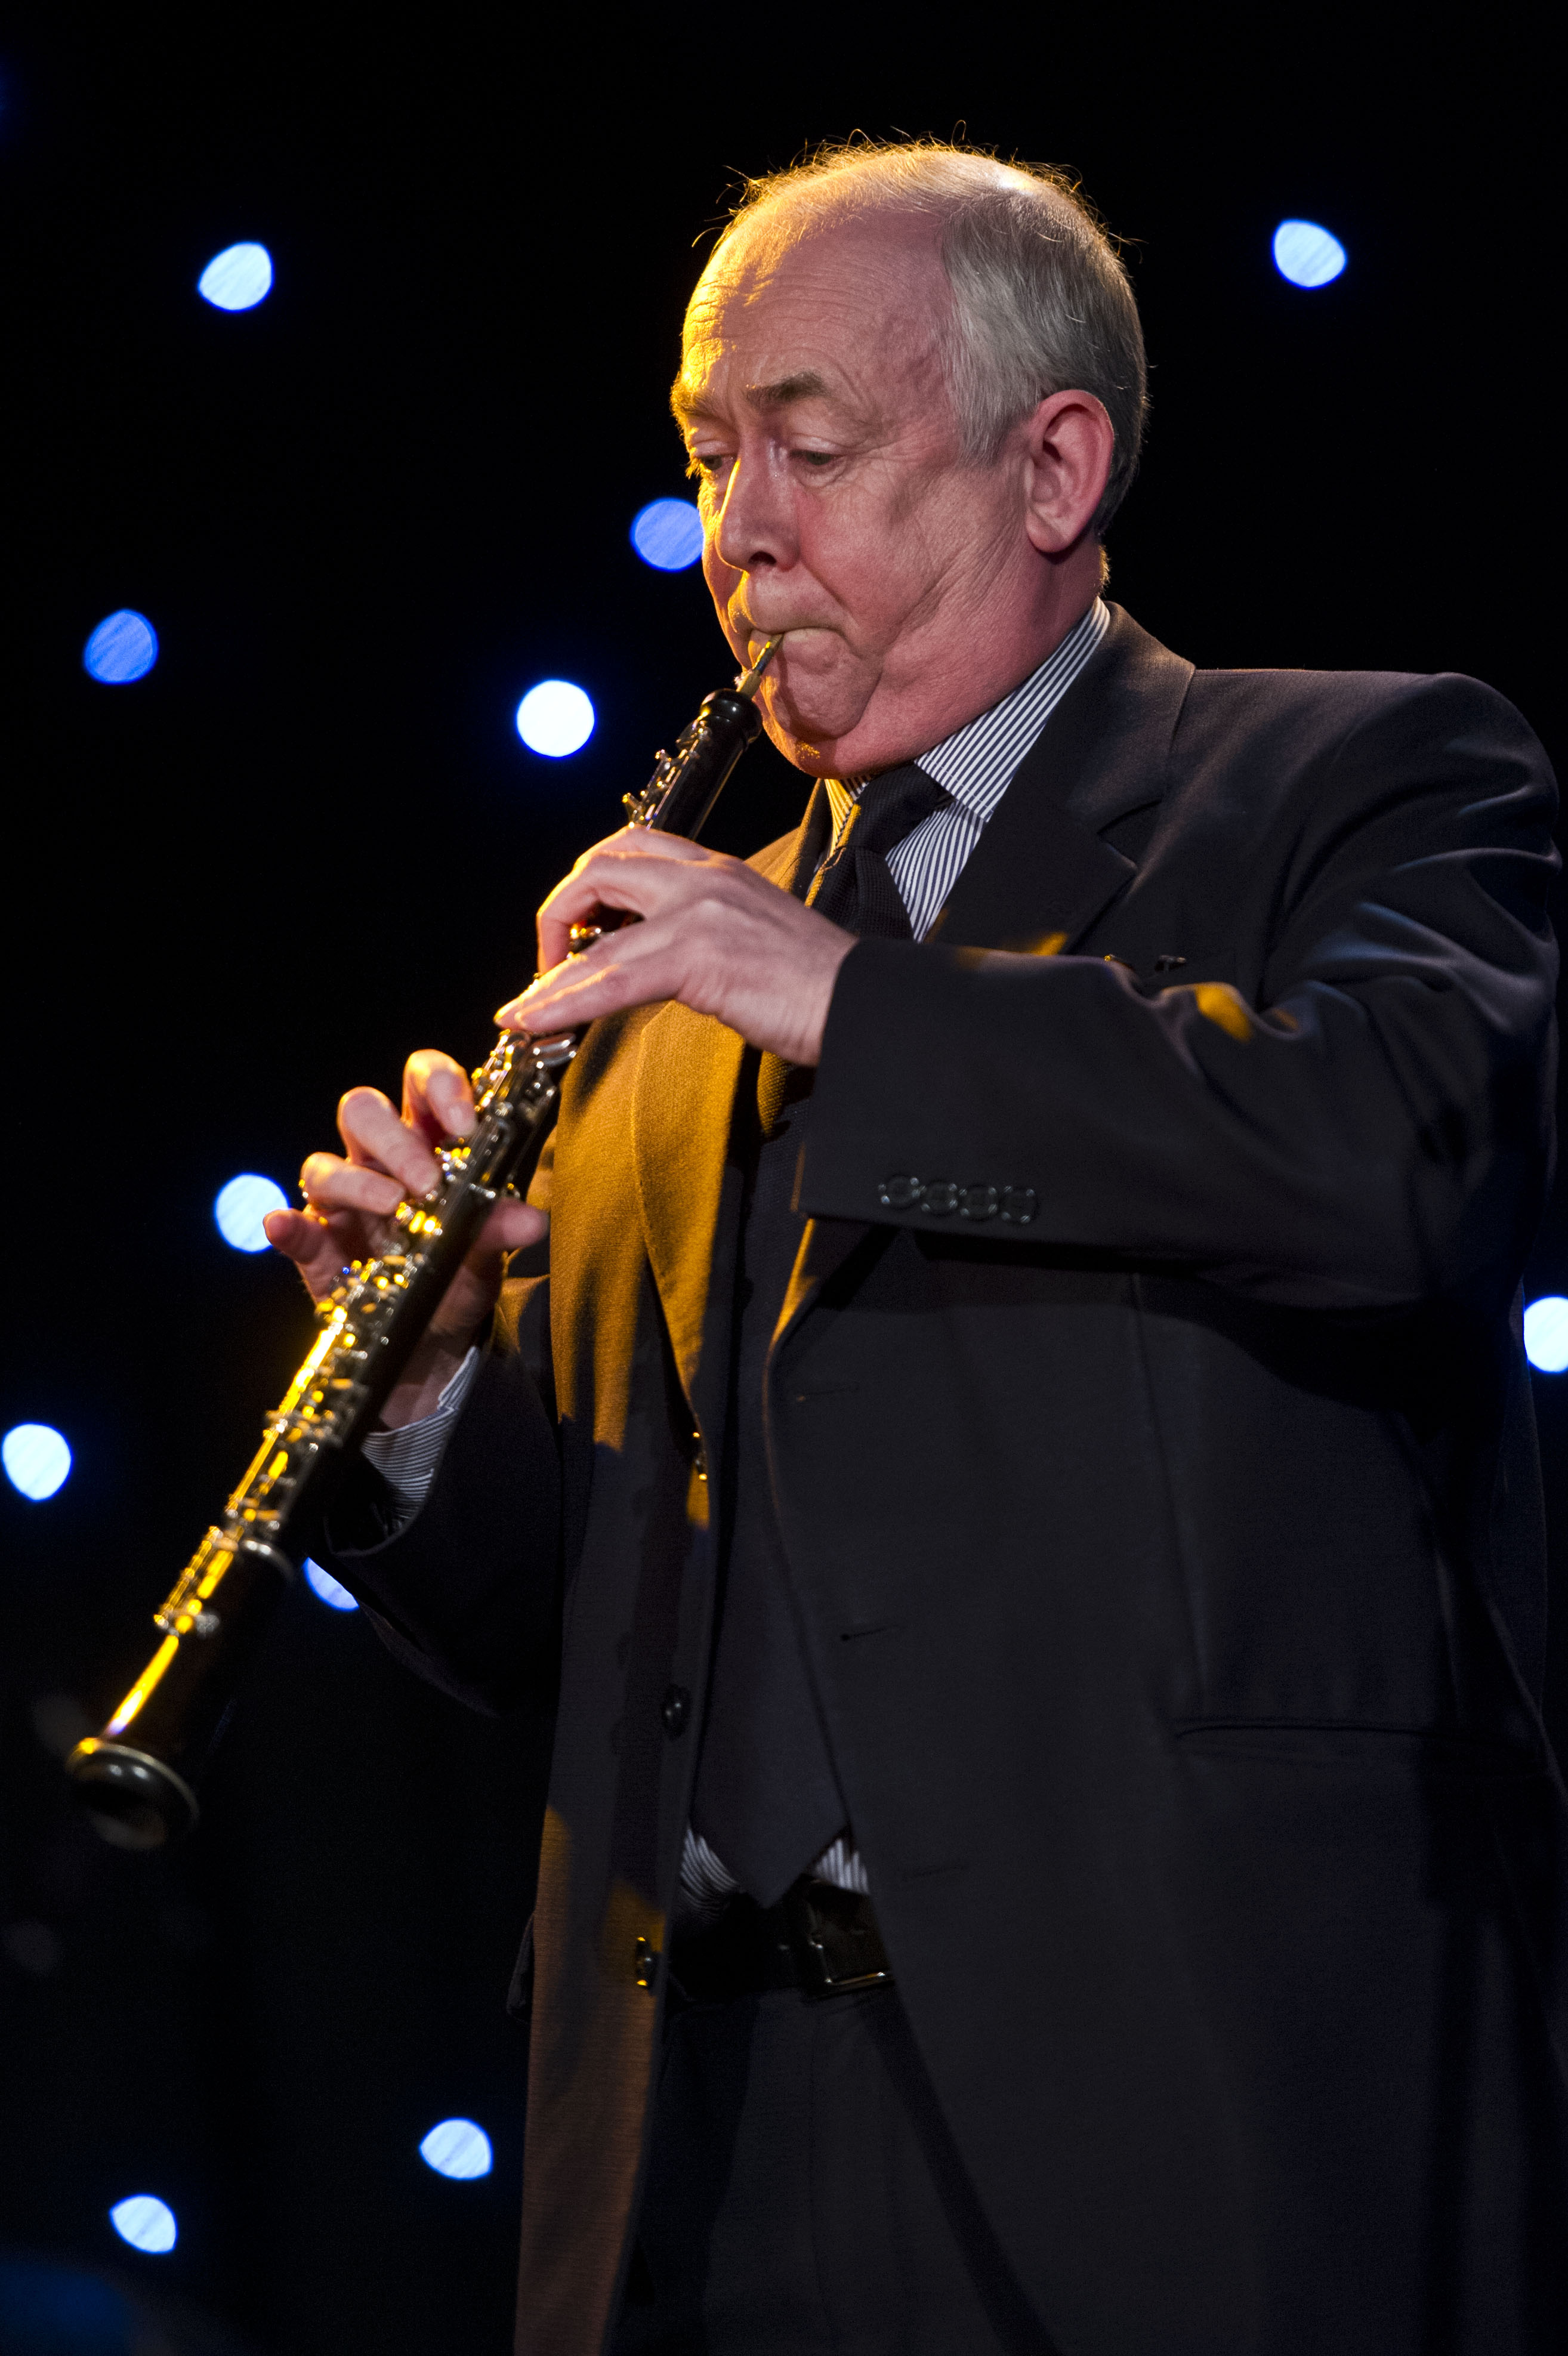 Wayne David playing the oboe